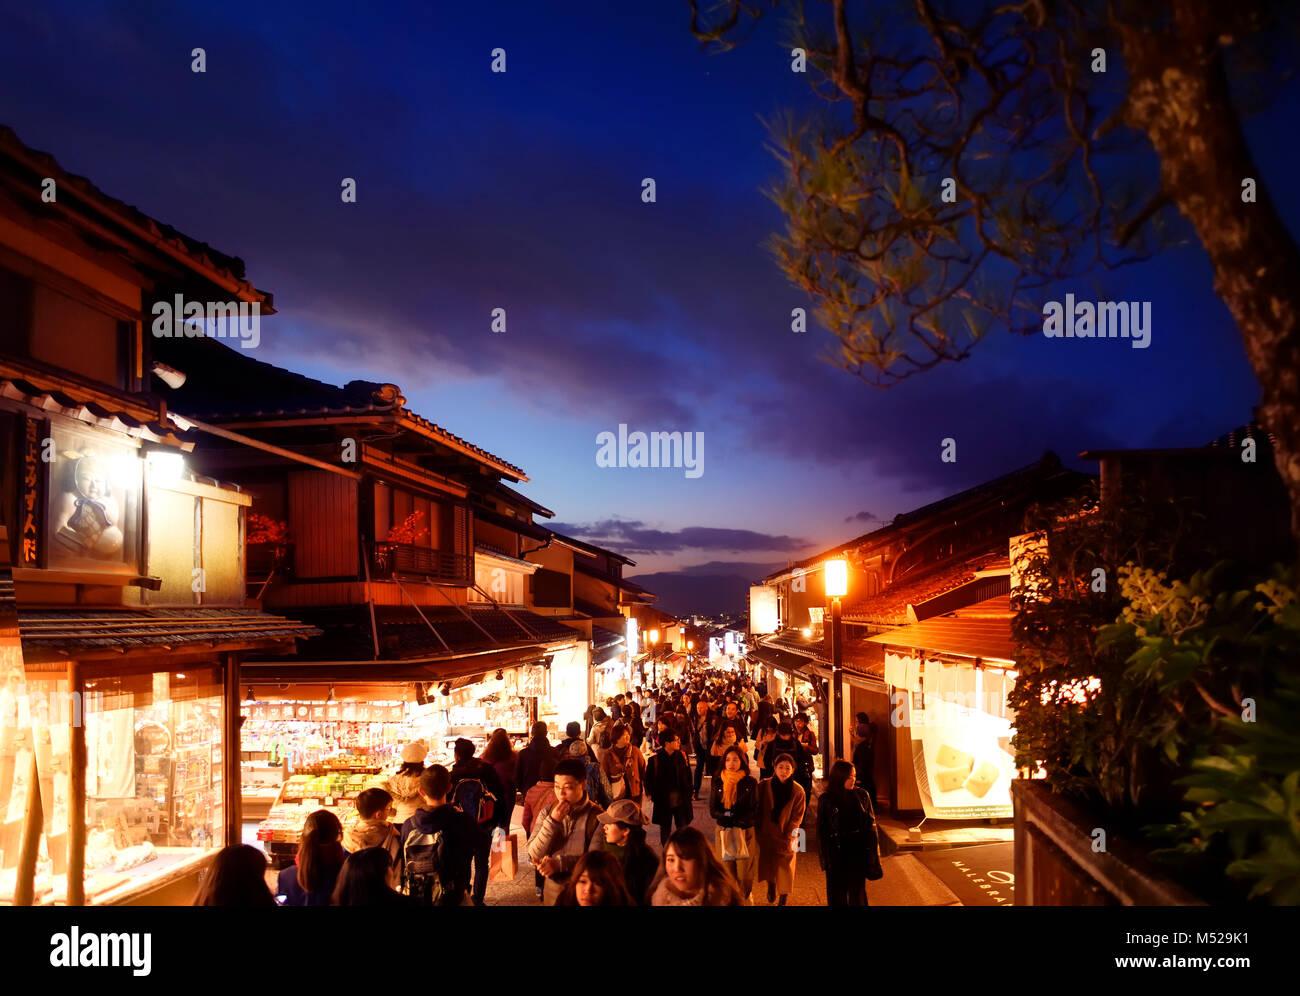 Matsubara dori à Kyoto dans la nuit pleine de gens et à proximité de temple Kiyomizu-dera. Higashiyama, Photo Stock